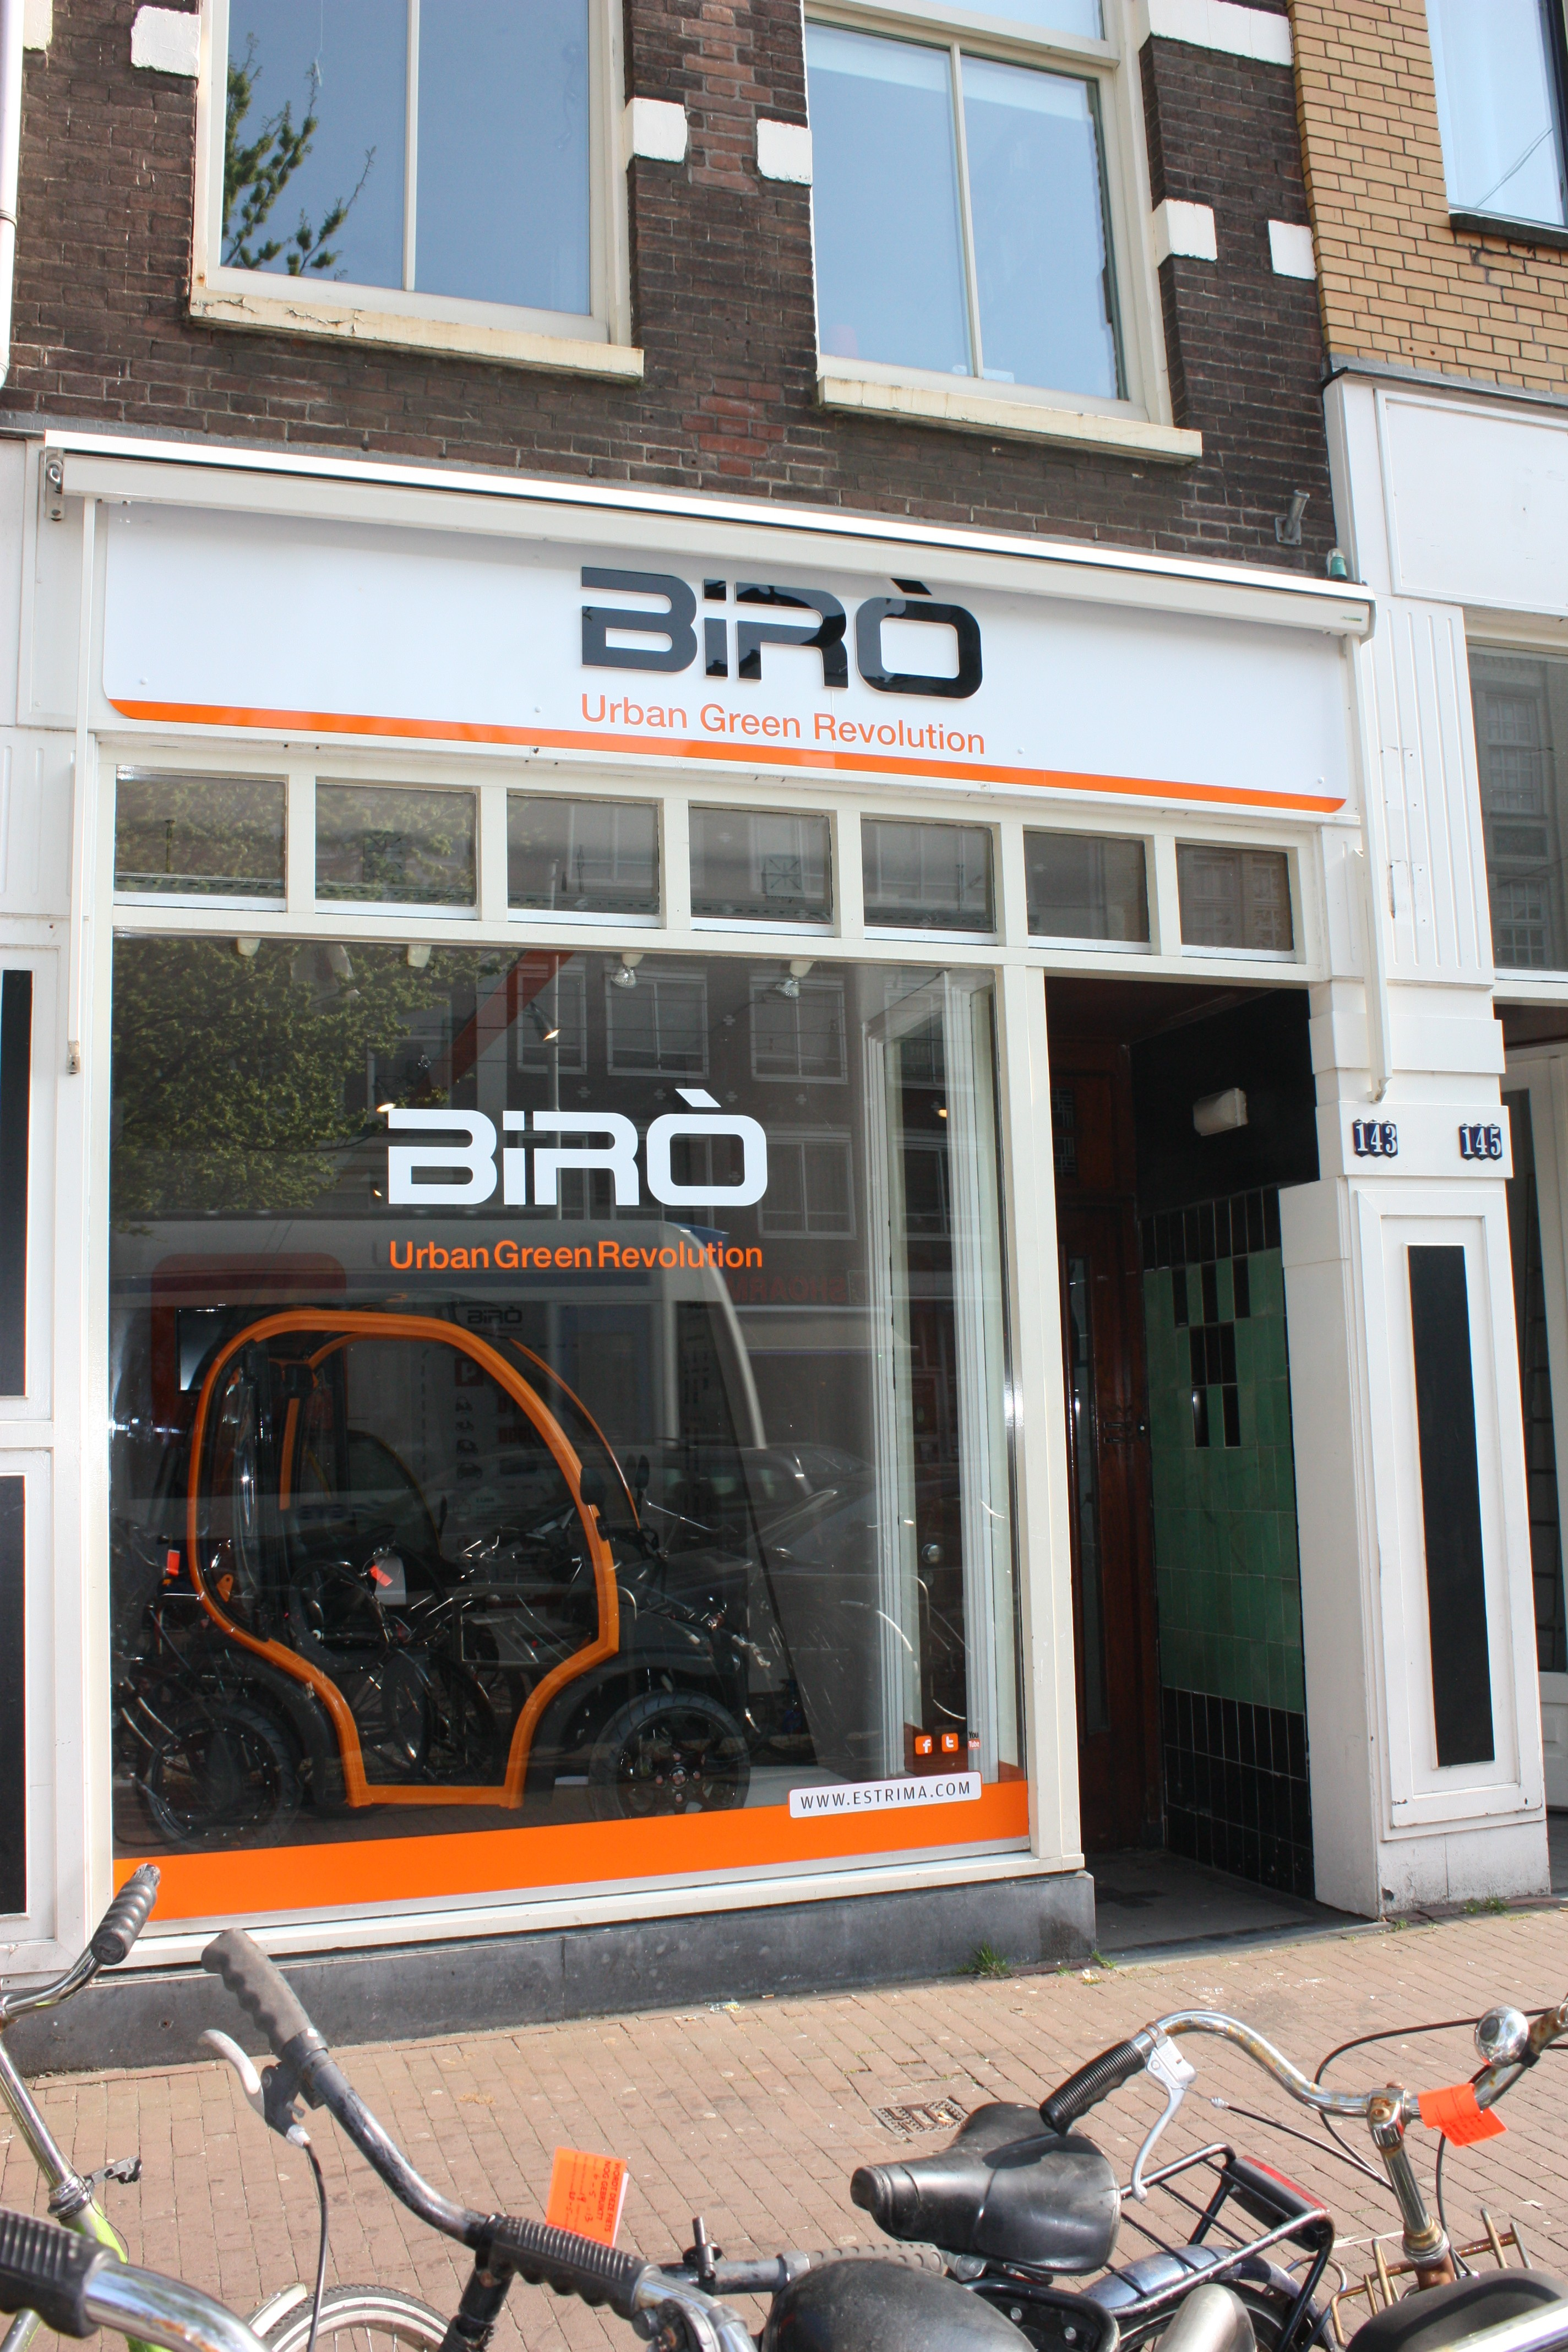 monomarca Birò ad Amsterdam